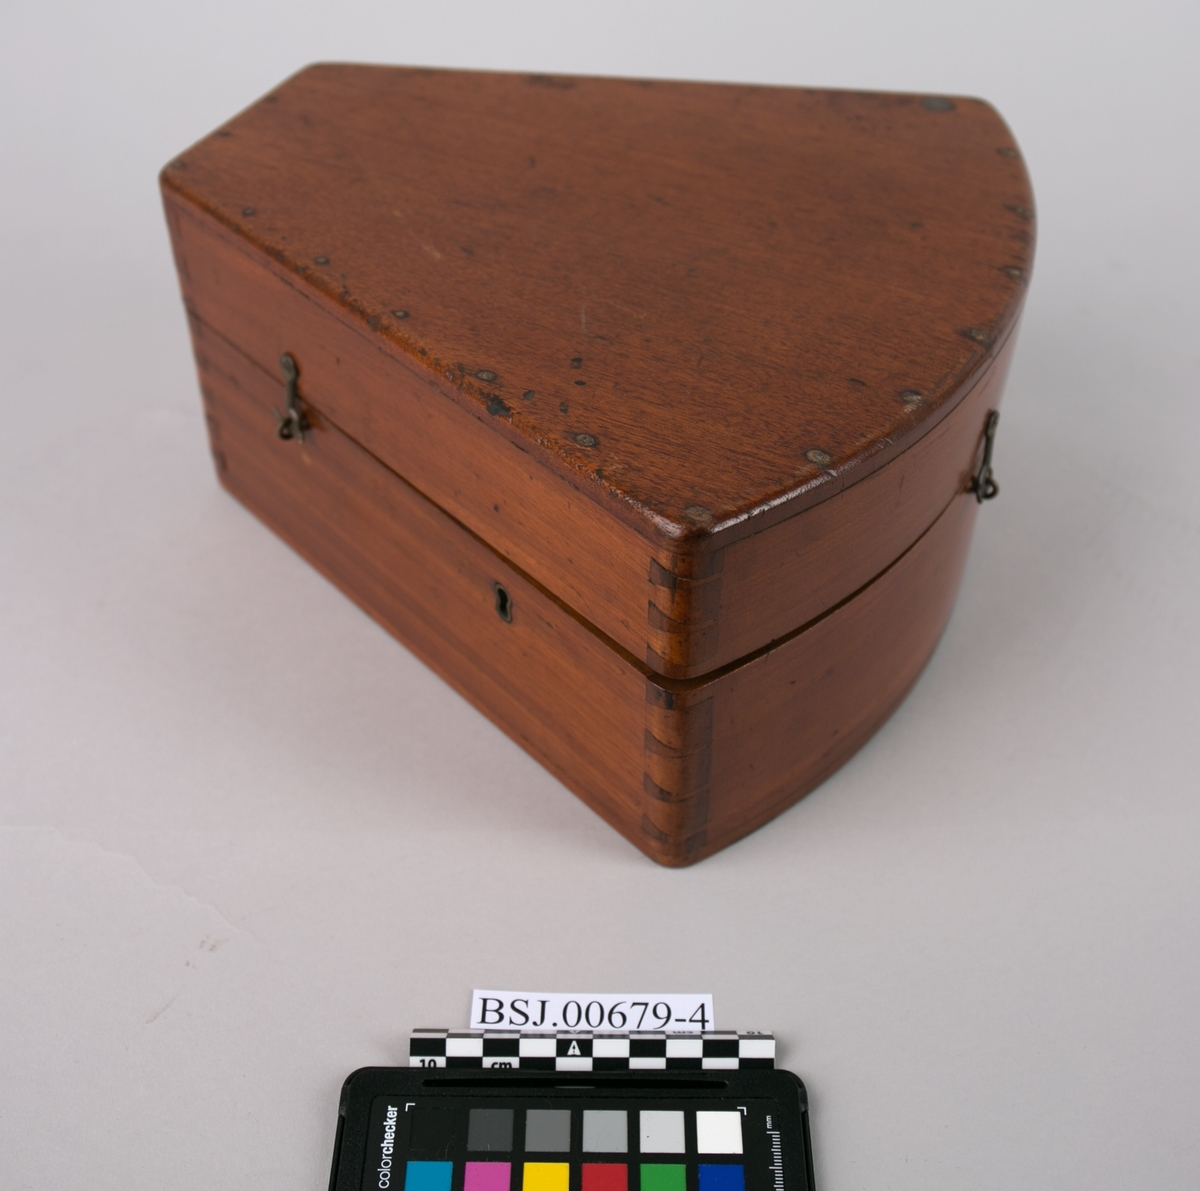 Kasse. Transportkasse til sekstant og løse deler til instrumentet. Trekantet kasse med buet form i den butte delen. Nøkkel mangler.